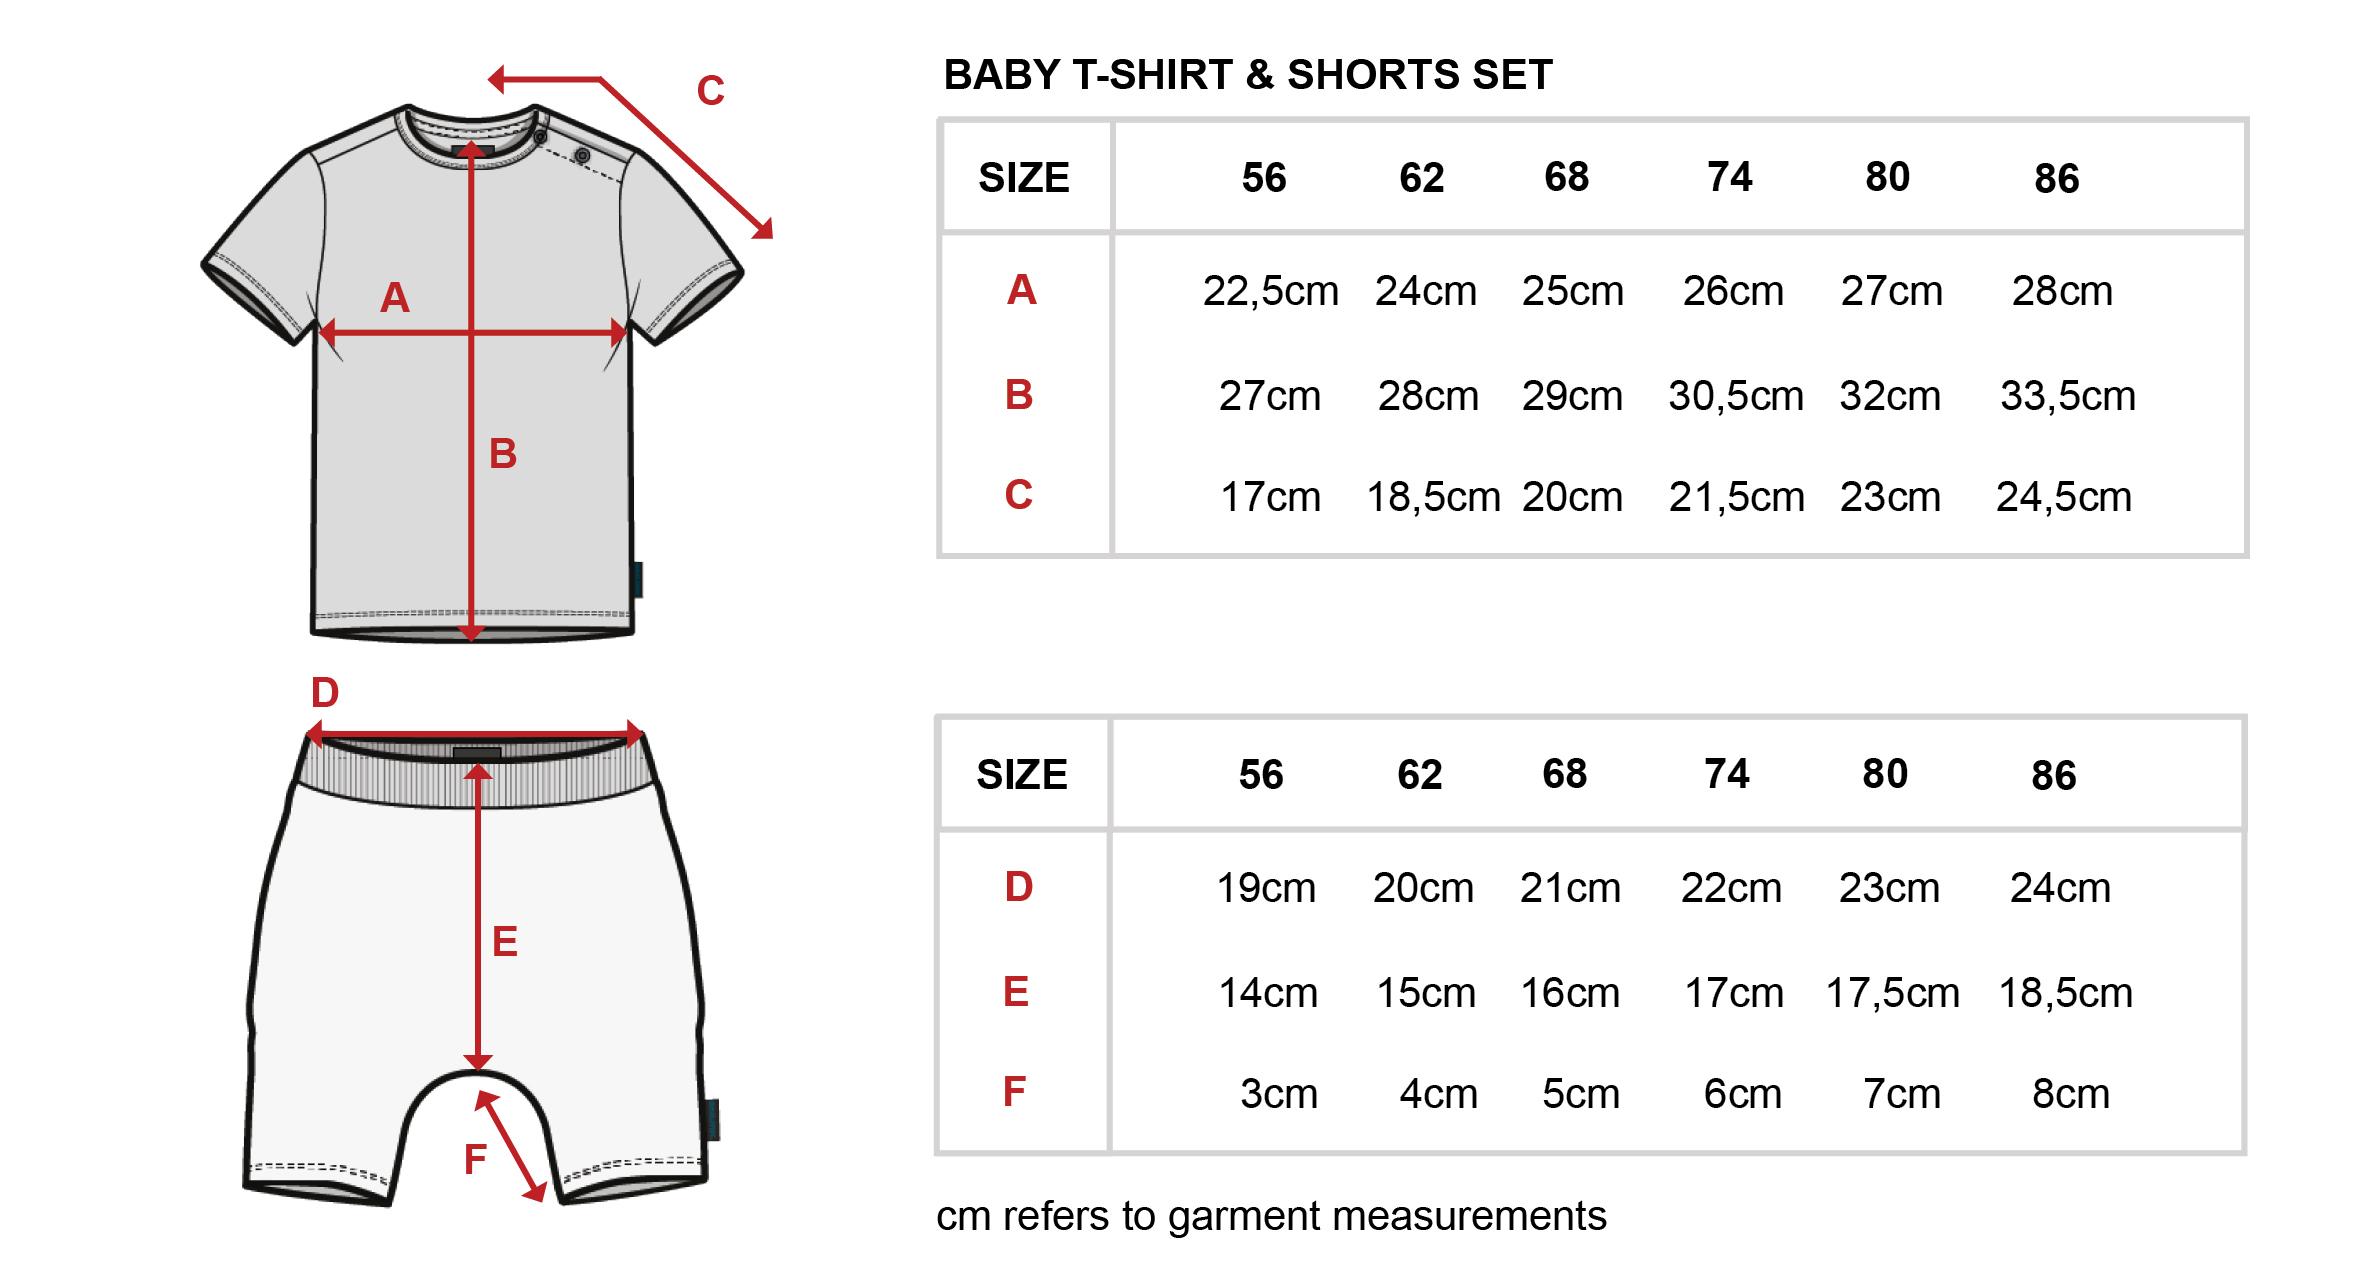 SS21-Baby-Set-T-shirt